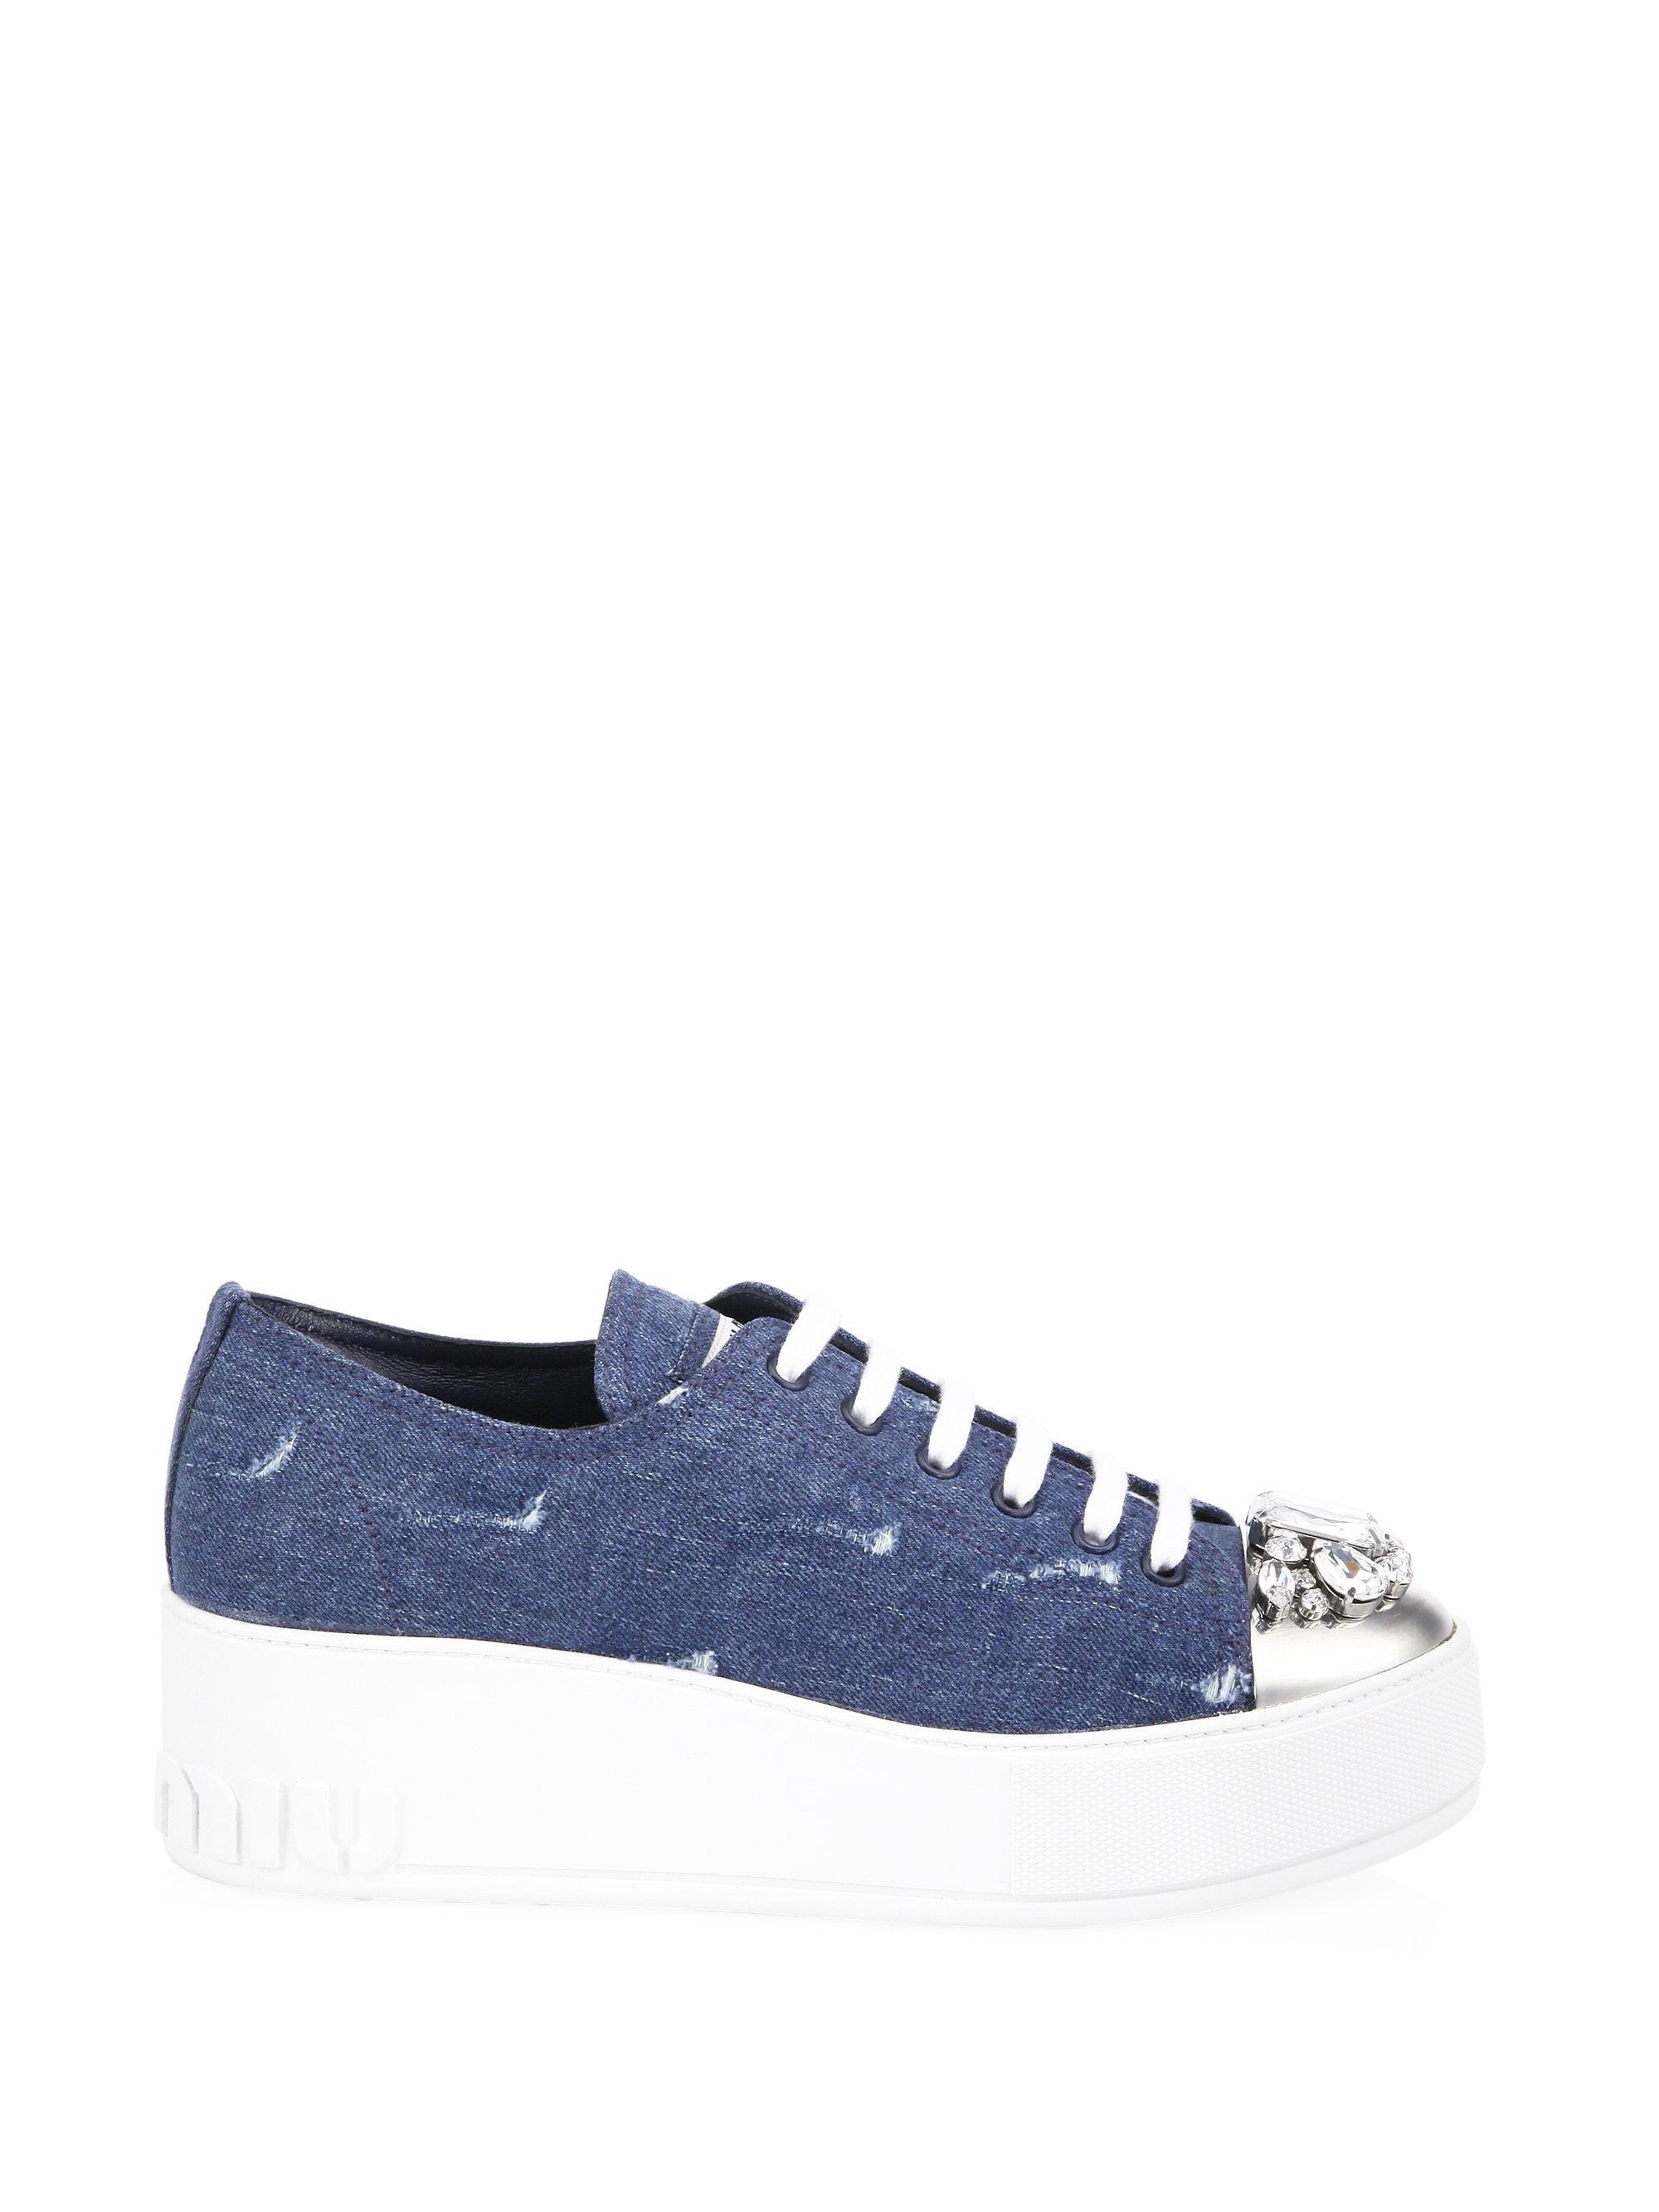 Miu Miu Jeweled Captoe Denim Platform Sneakers XBLNt5j5